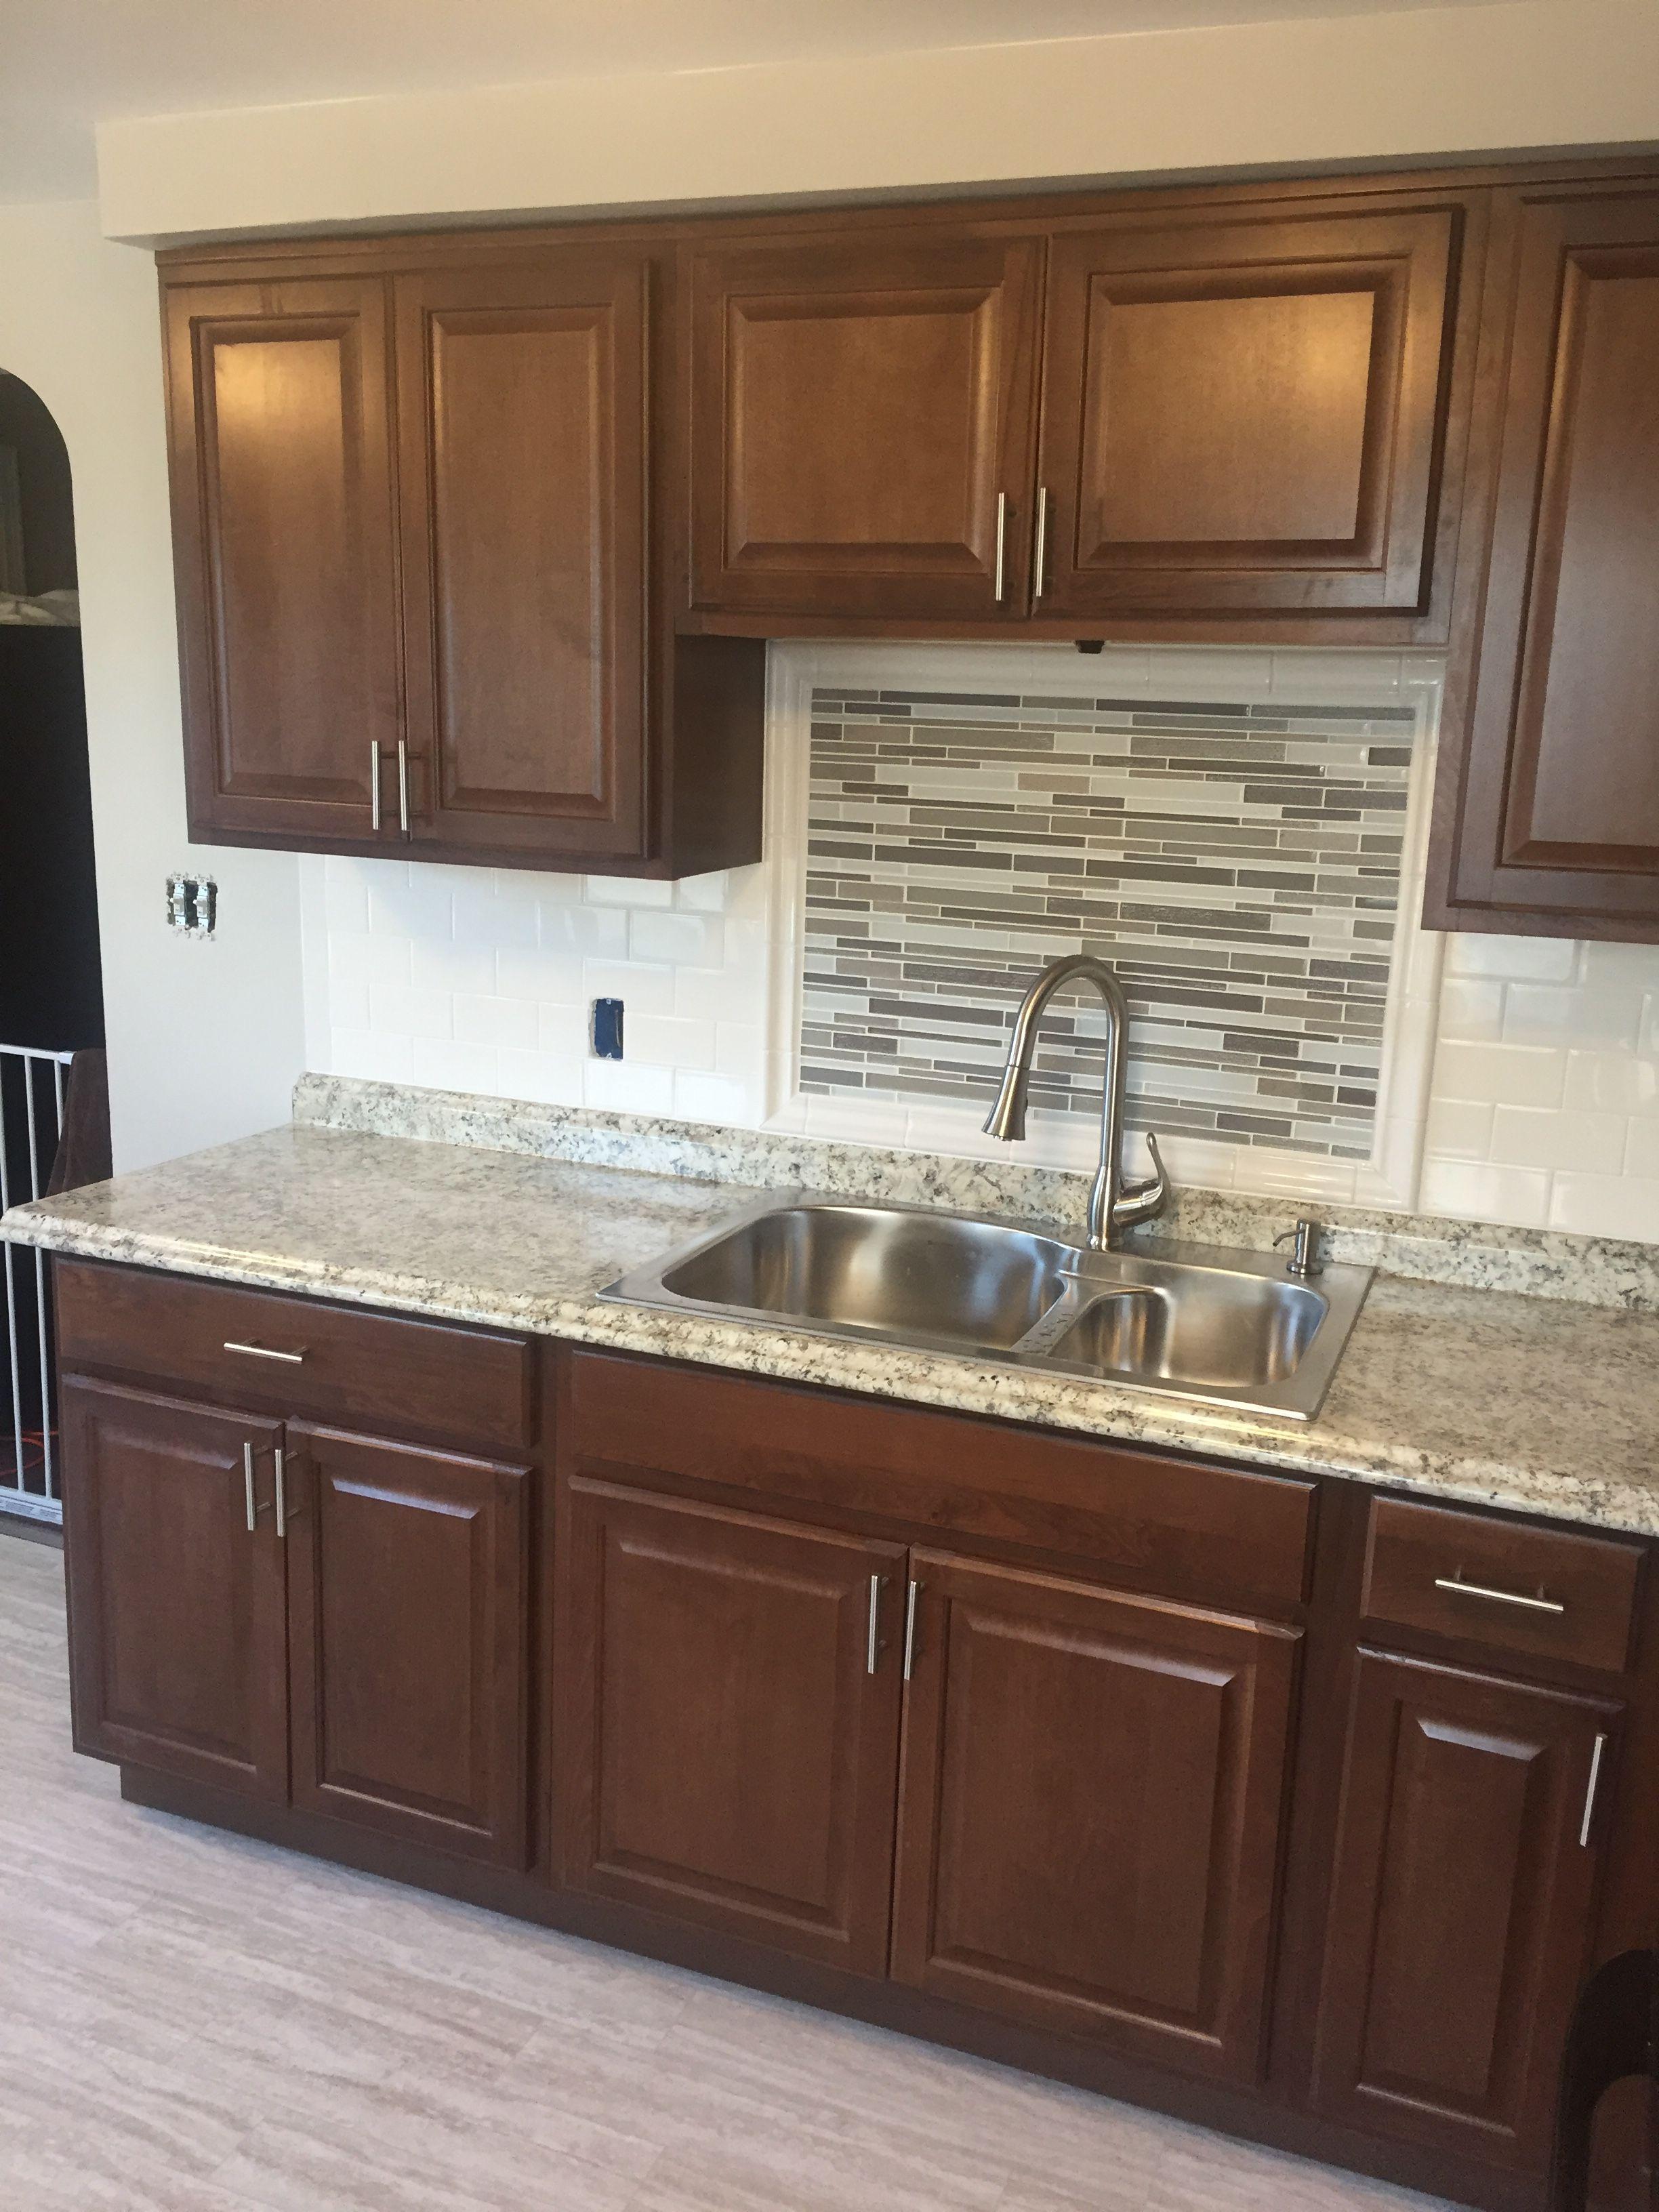 Hampton Bay Kitchen Cabinets Dimensions  Wow Blog